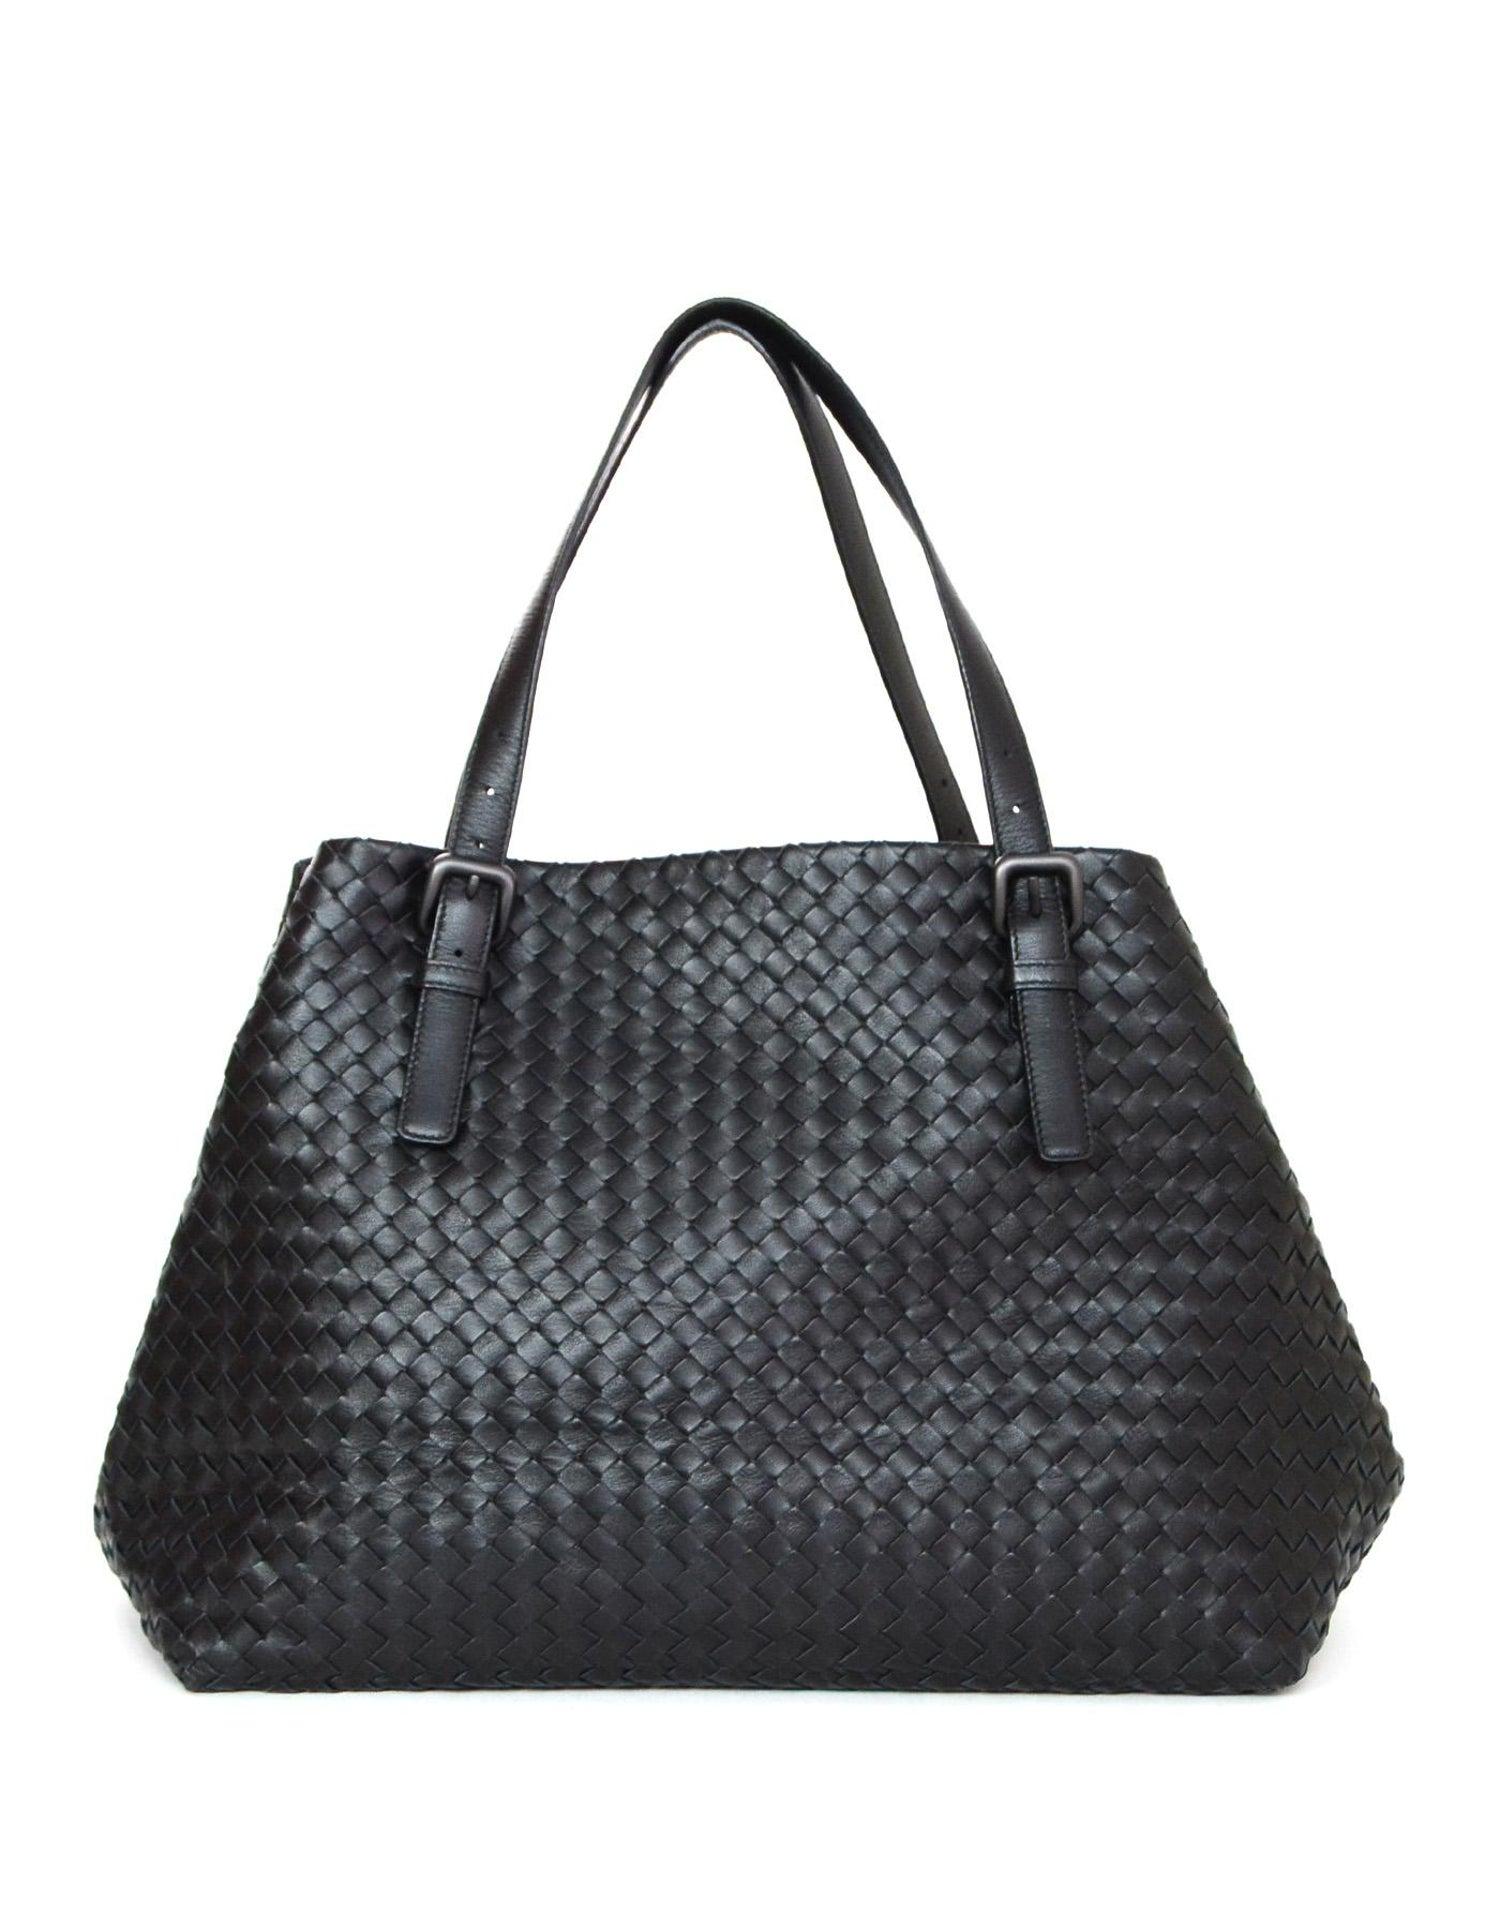 e4d94d9273 Bottega Veneta Black Woven Intrecciato Leather Large Cesta Tote Bag For Sale  at 1stdibs